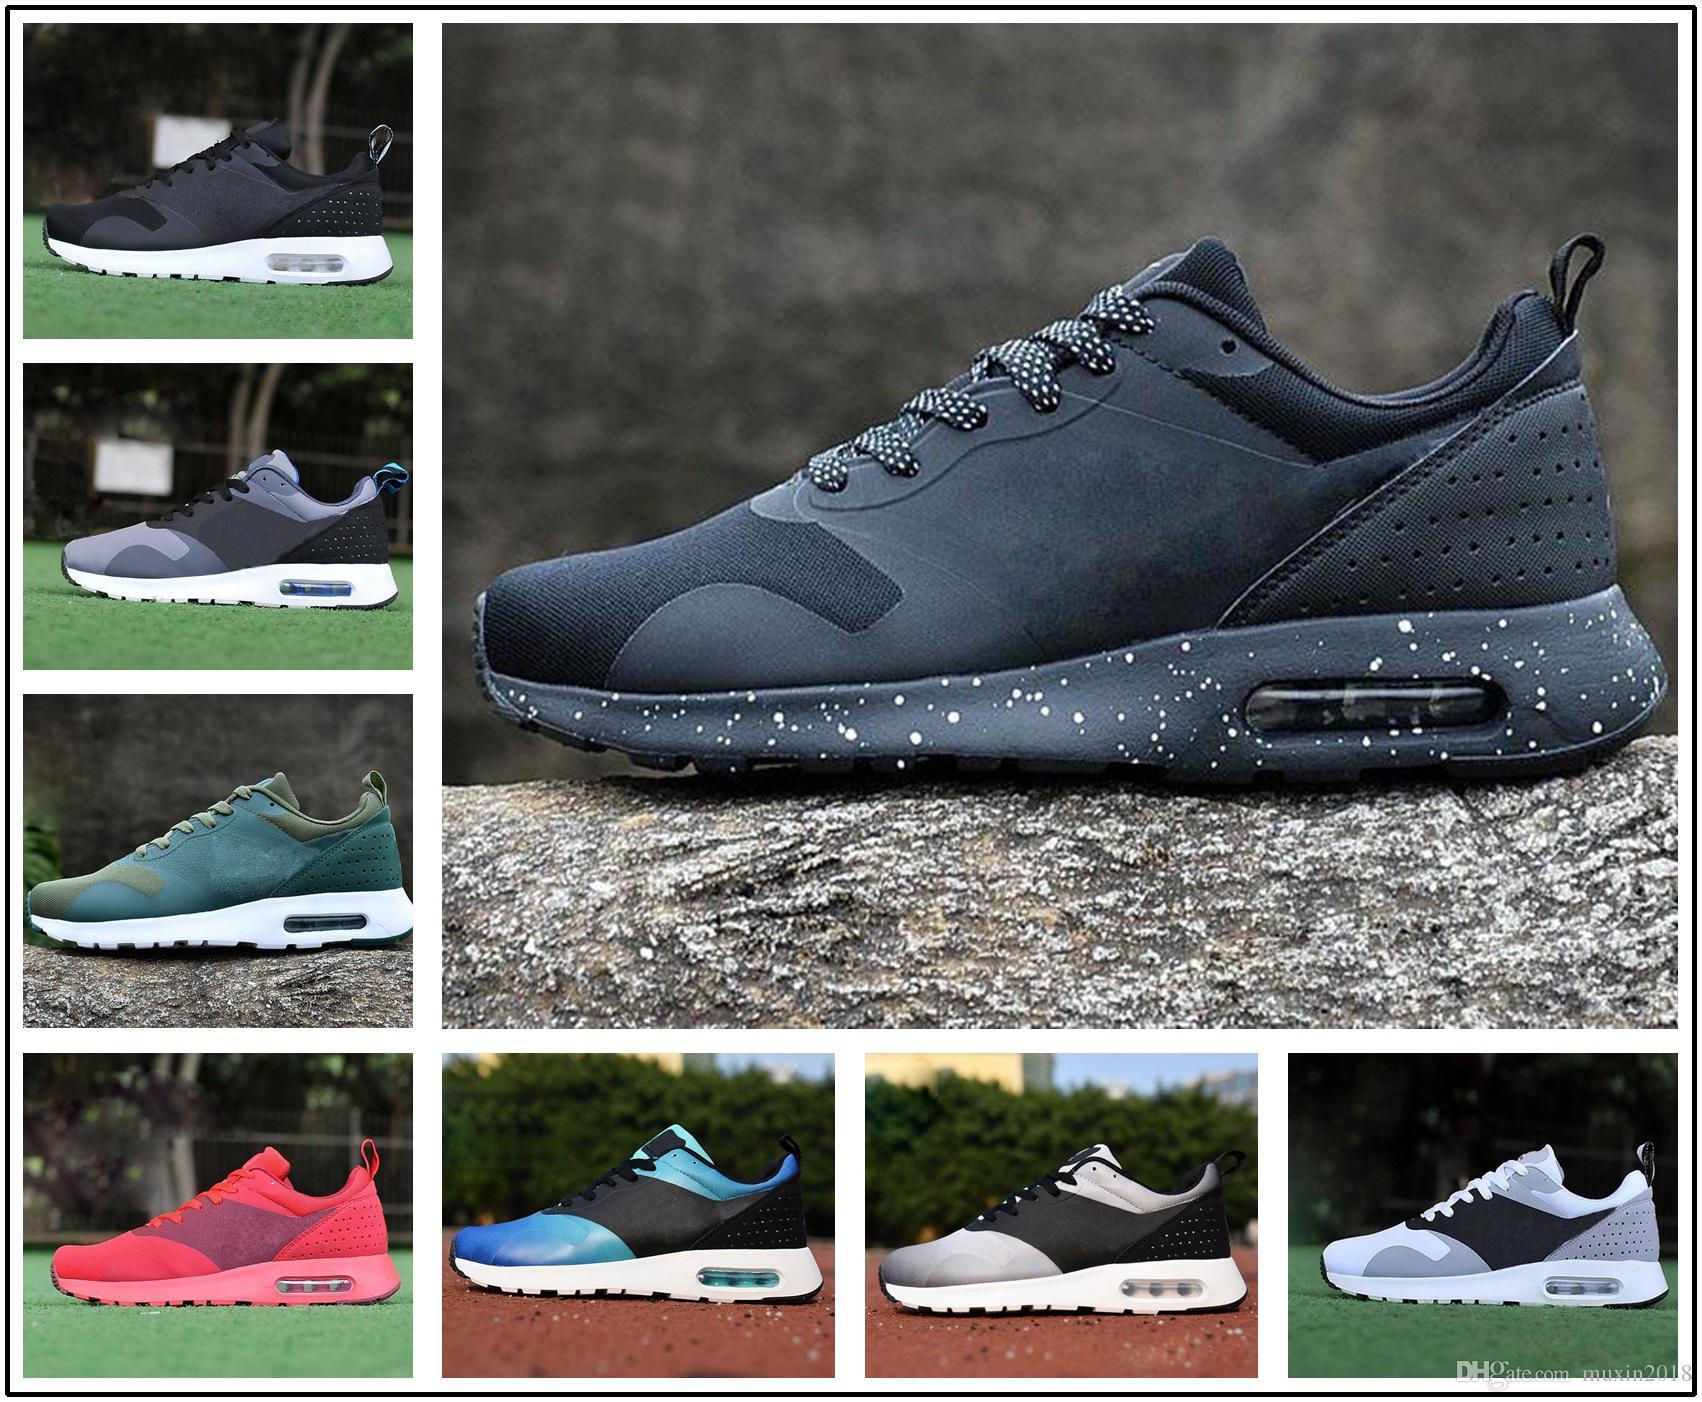 796269b67820 Acheter Nike Air Max 87 90 Airmax 87 90 2017 2018 87 Hommes Camouflage  RUNNING Chaussures 100% Original Tout Noir Chaussures De Sport Thea 2017  Chaussures ...